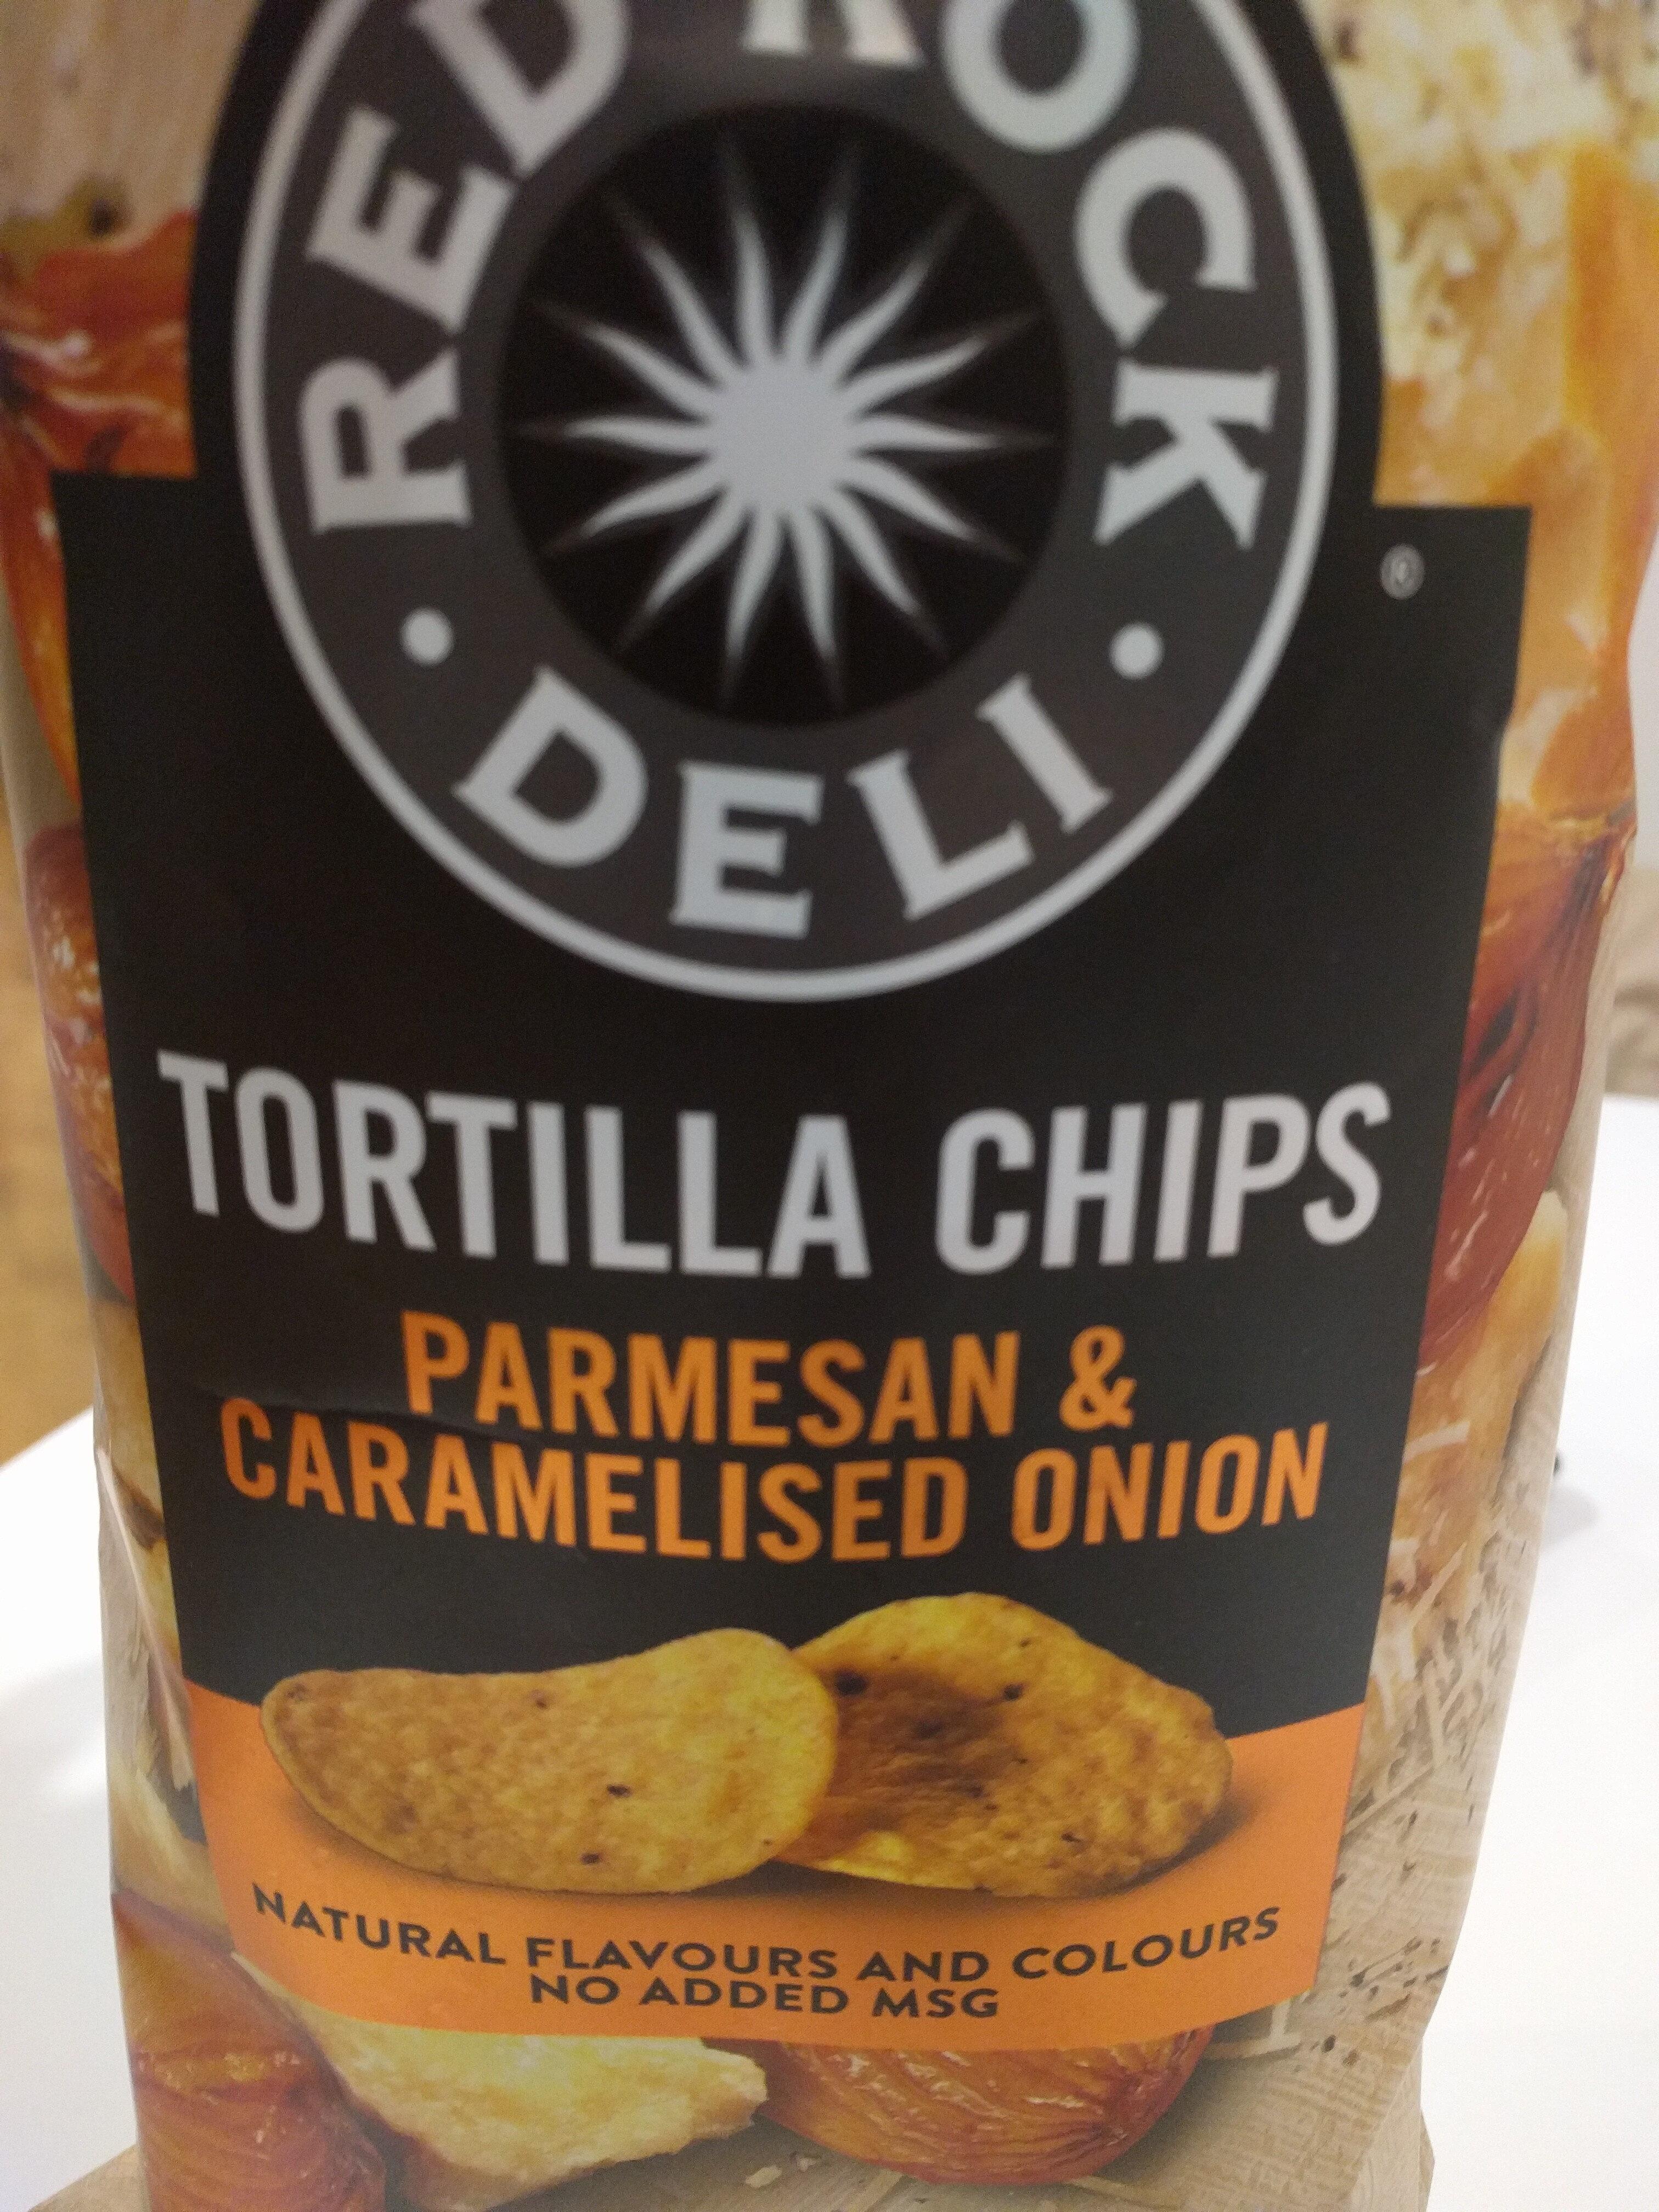 Tortilla Chips (Parmesan & Caramelised Onion) - Product - en